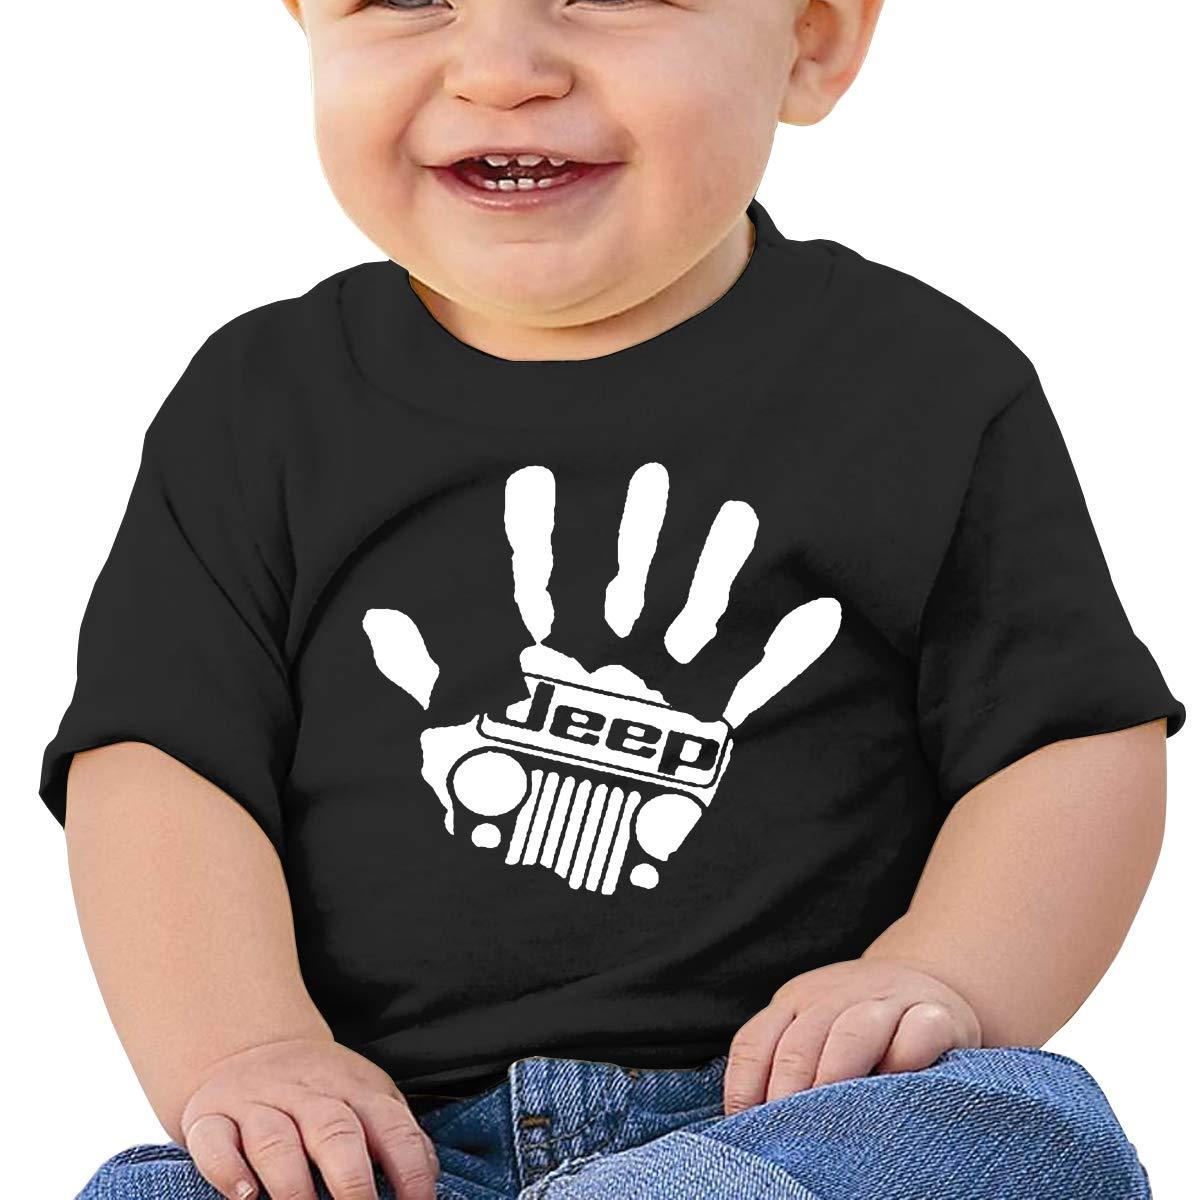 Baby T-shirt Jeep Girl Caps Children\'s Cotton T-shirt T-shirts